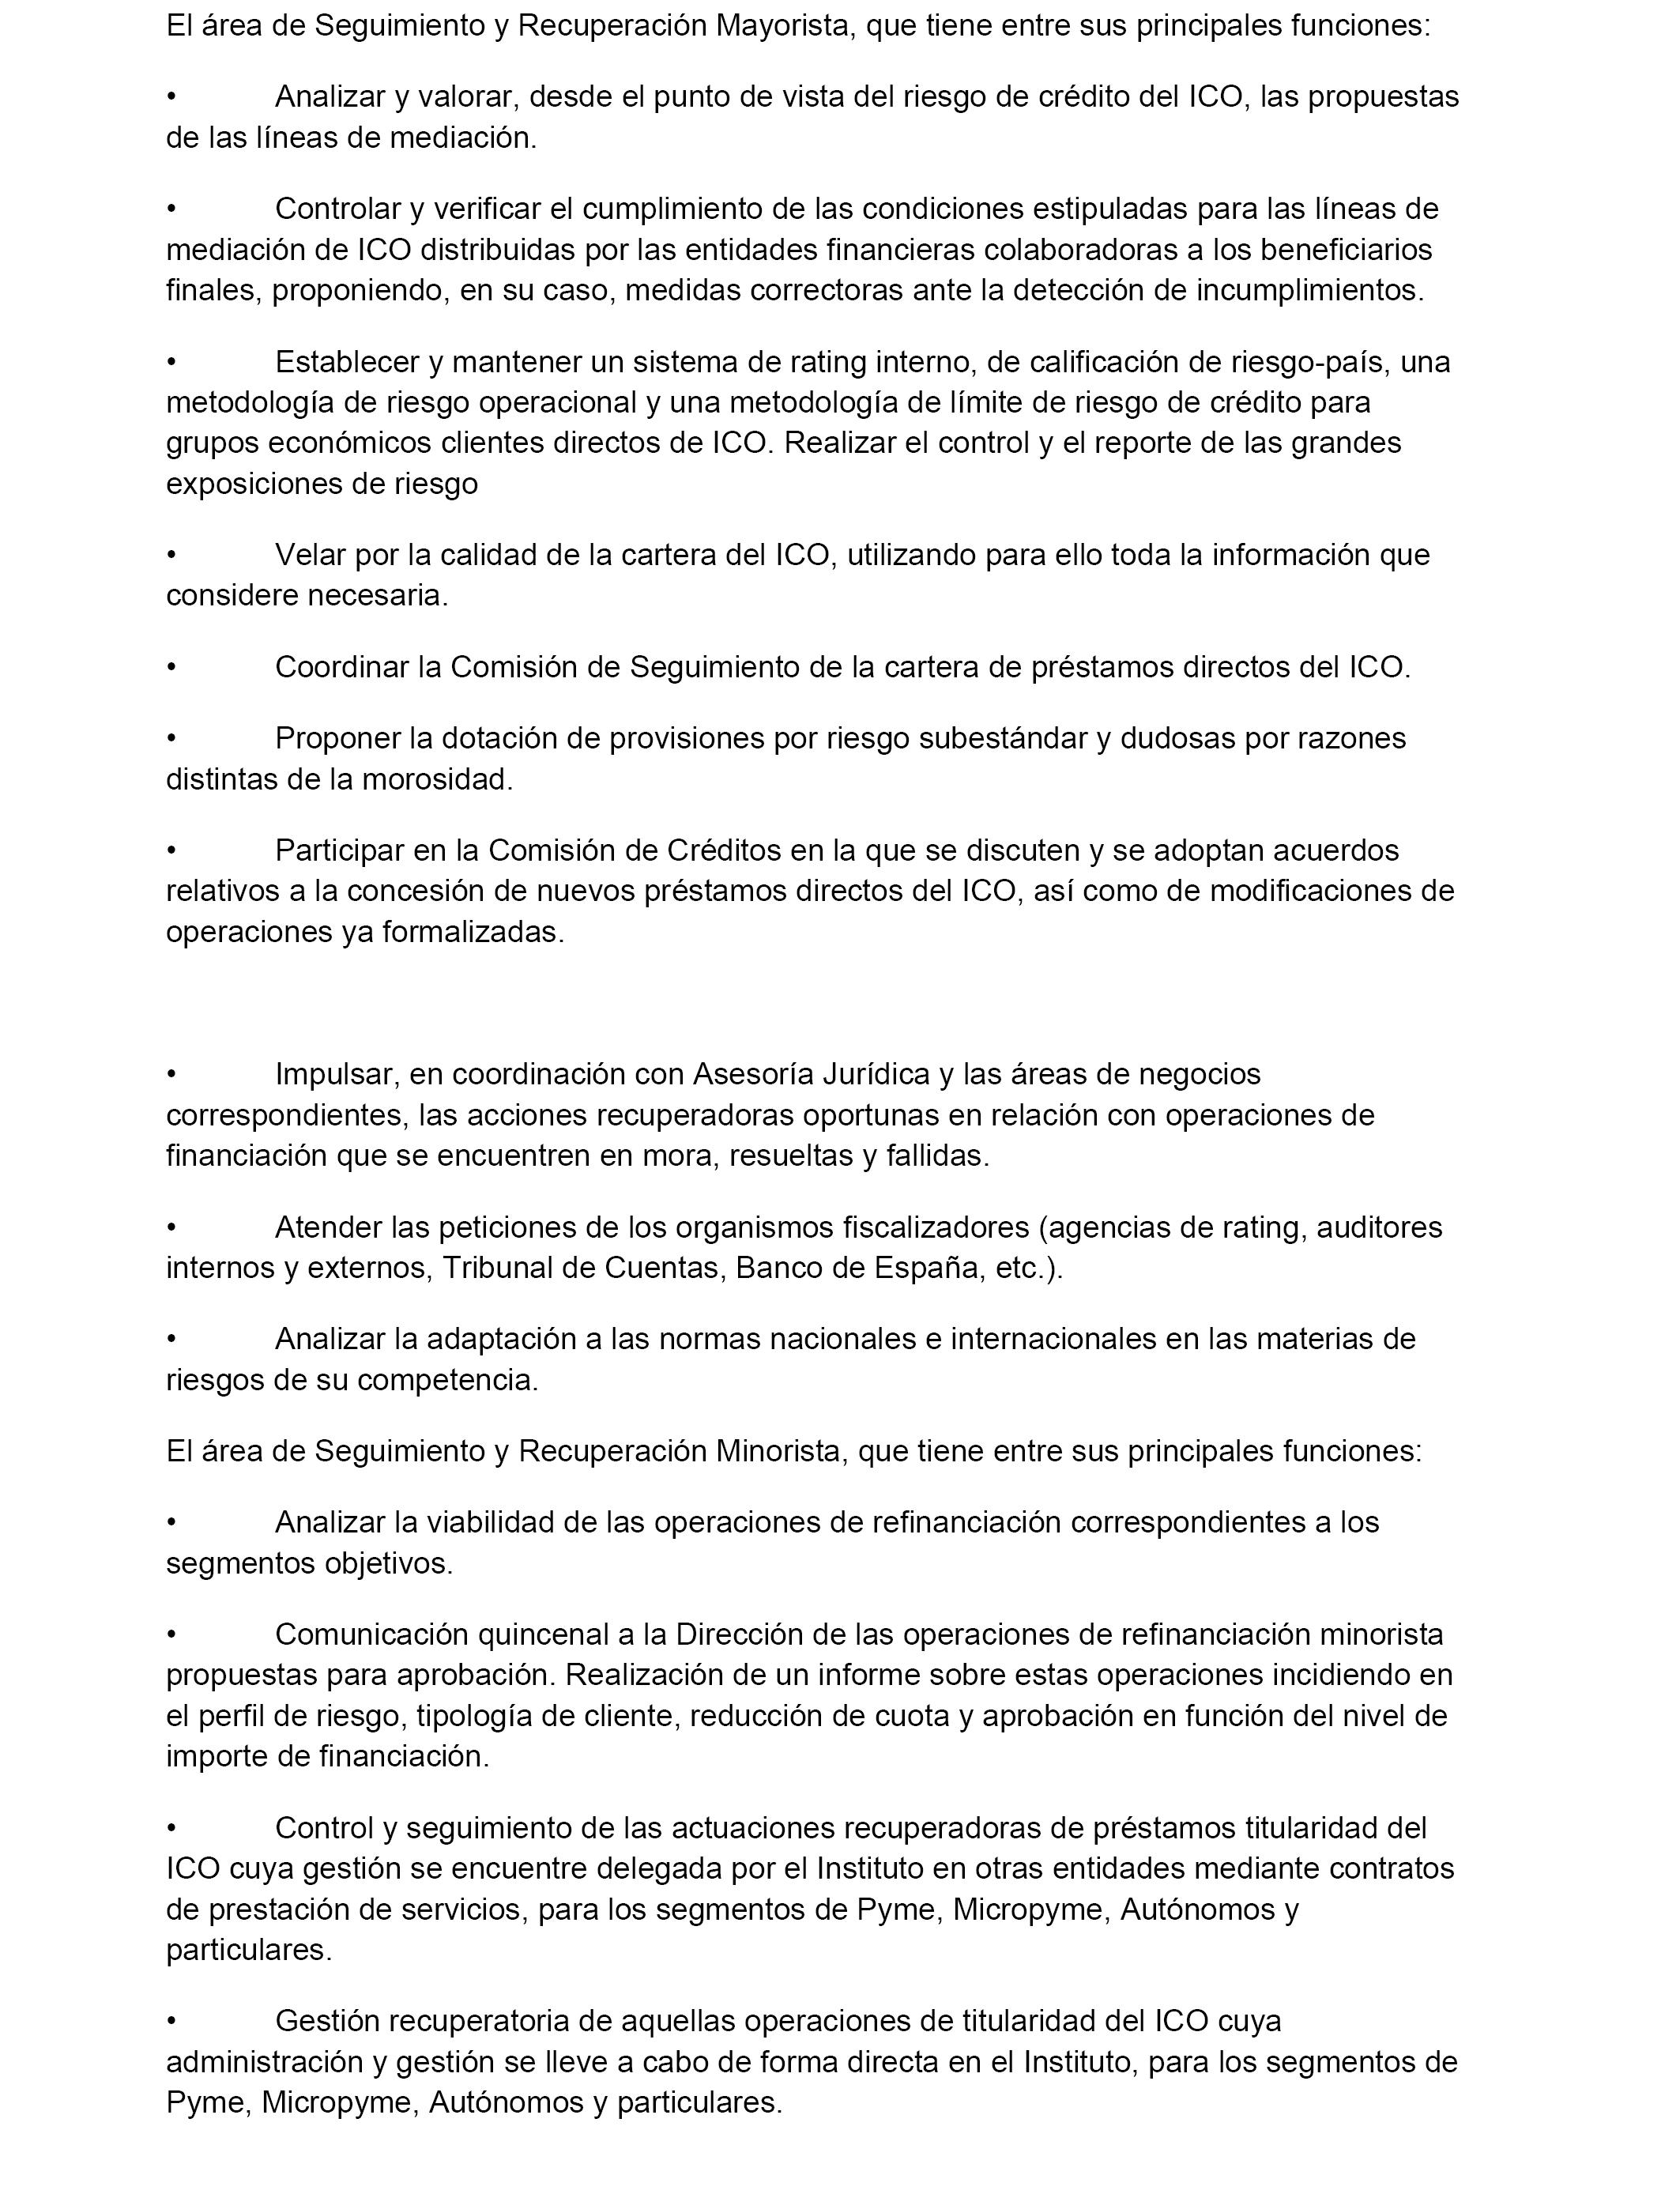 BOE.es - Documento BOE-A-2016-7396